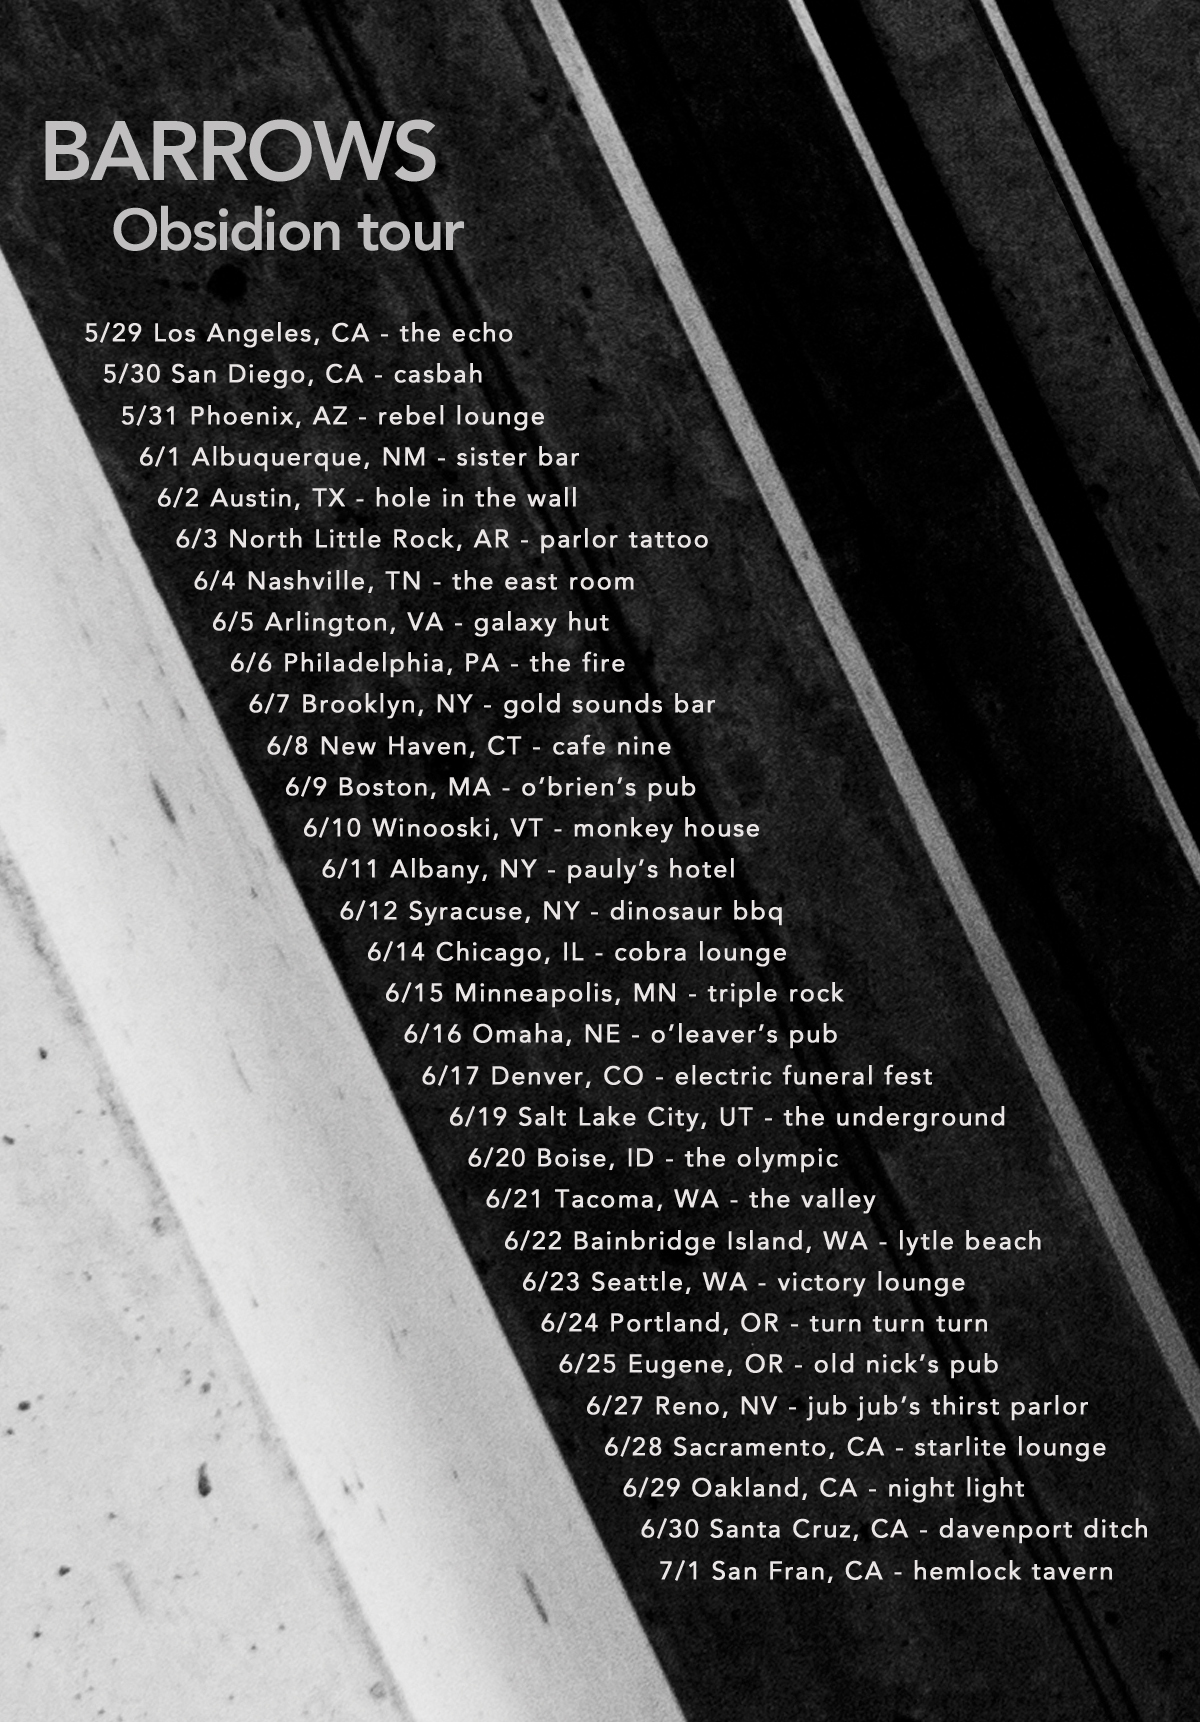 BARROWS OBSIDION TOUR FLYER